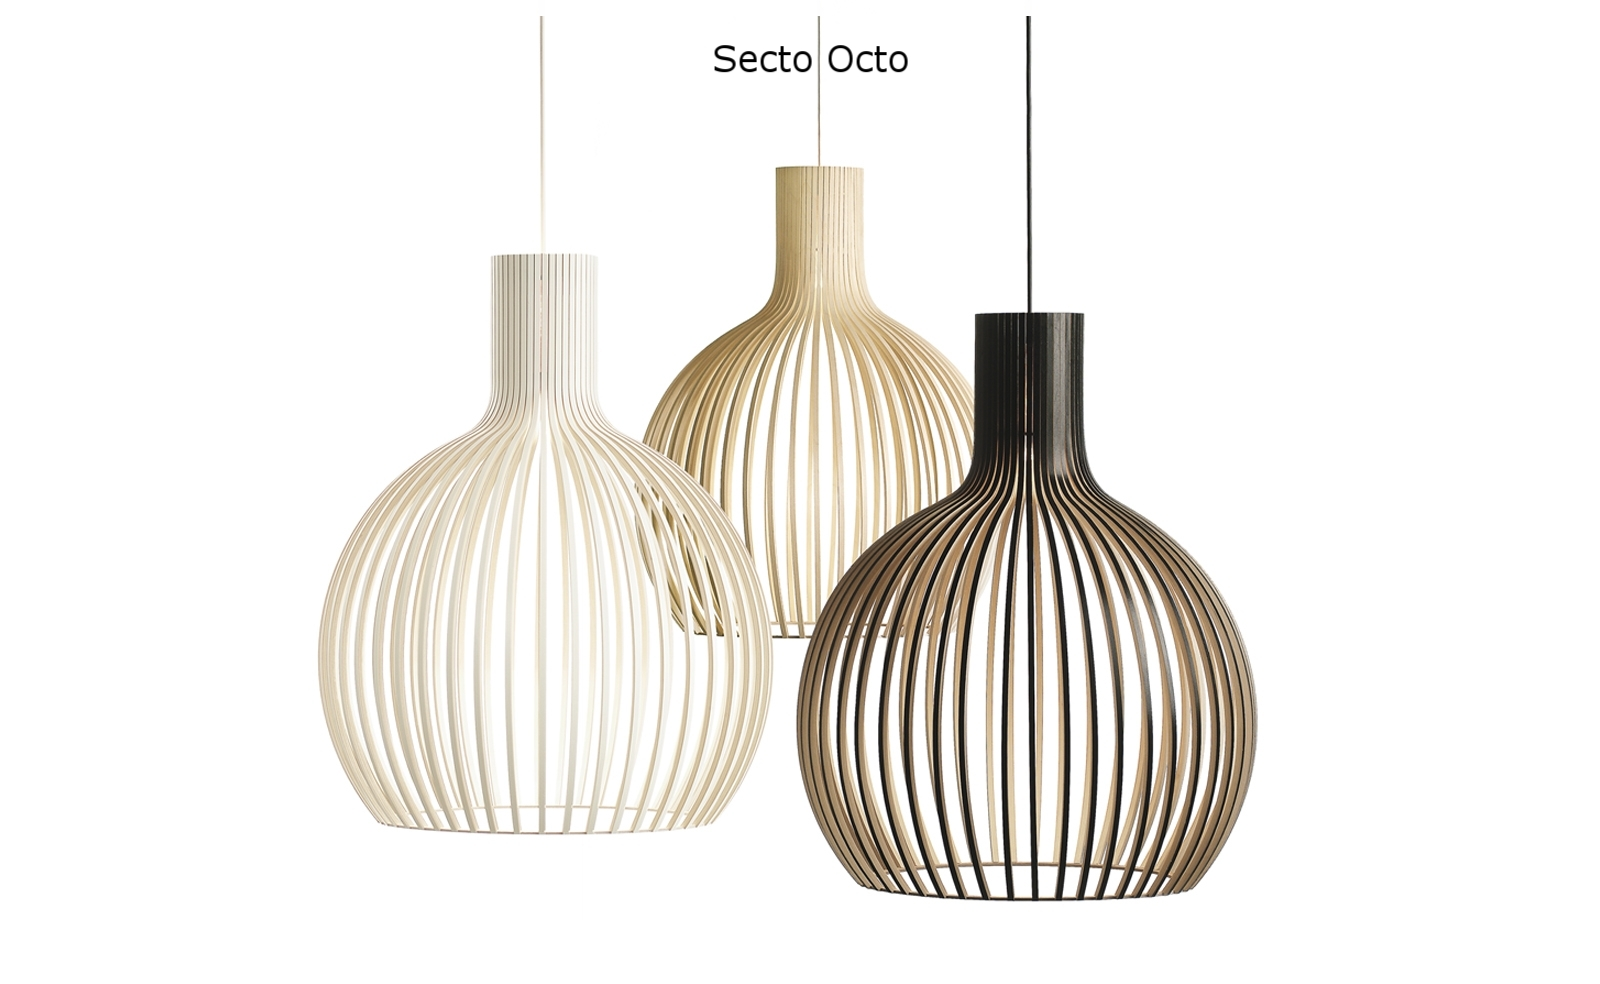 secto-octo-band-verlichting.jpg